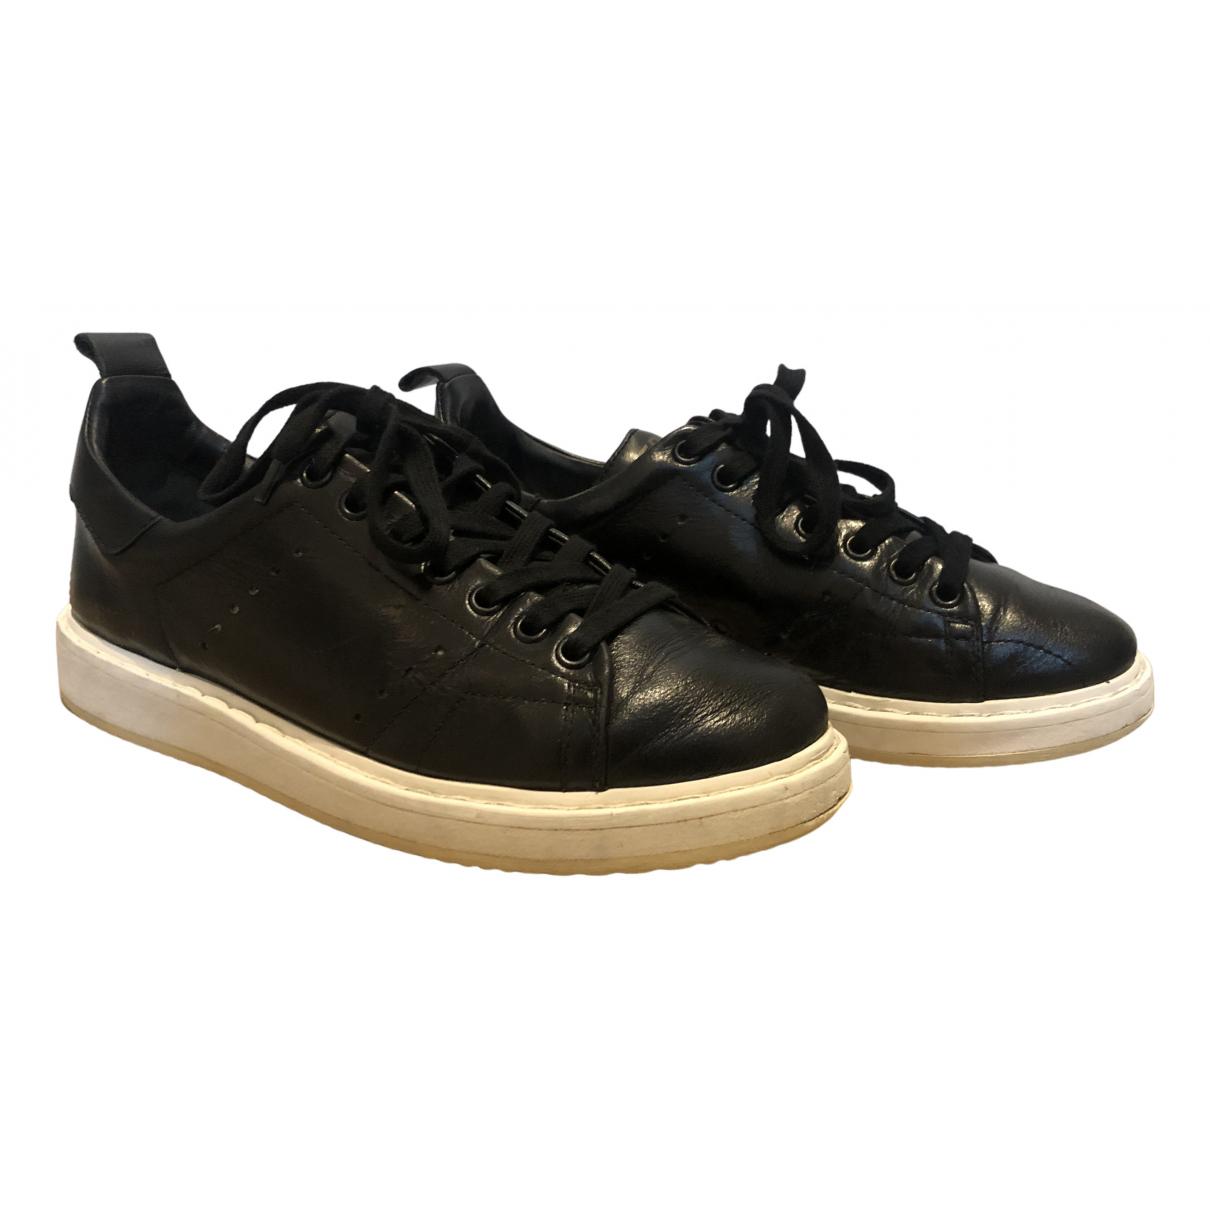 Golden Goose - Baskets Starter pour femme en cuir - noir